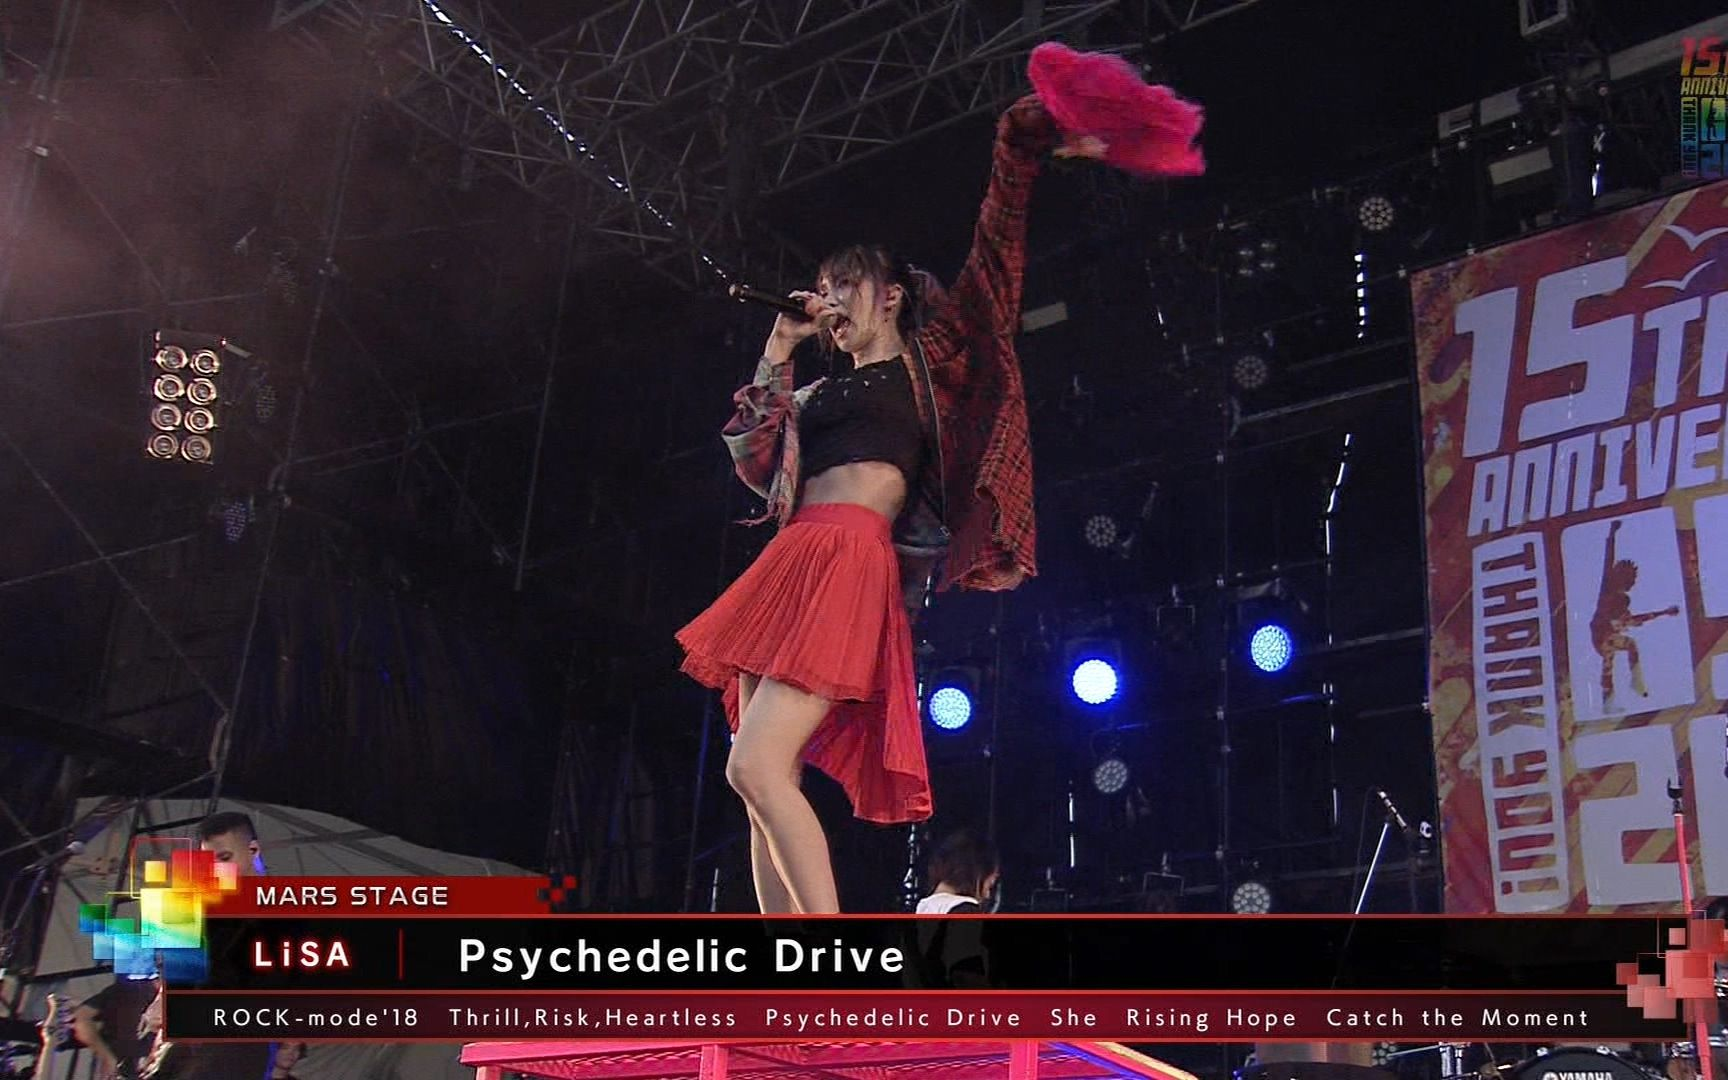 Lisa Psychedelic Drive Rock Mode 18 18 09 08 Treasure05x 2018 哔哩哔哩 つロ干杯 Bilibili